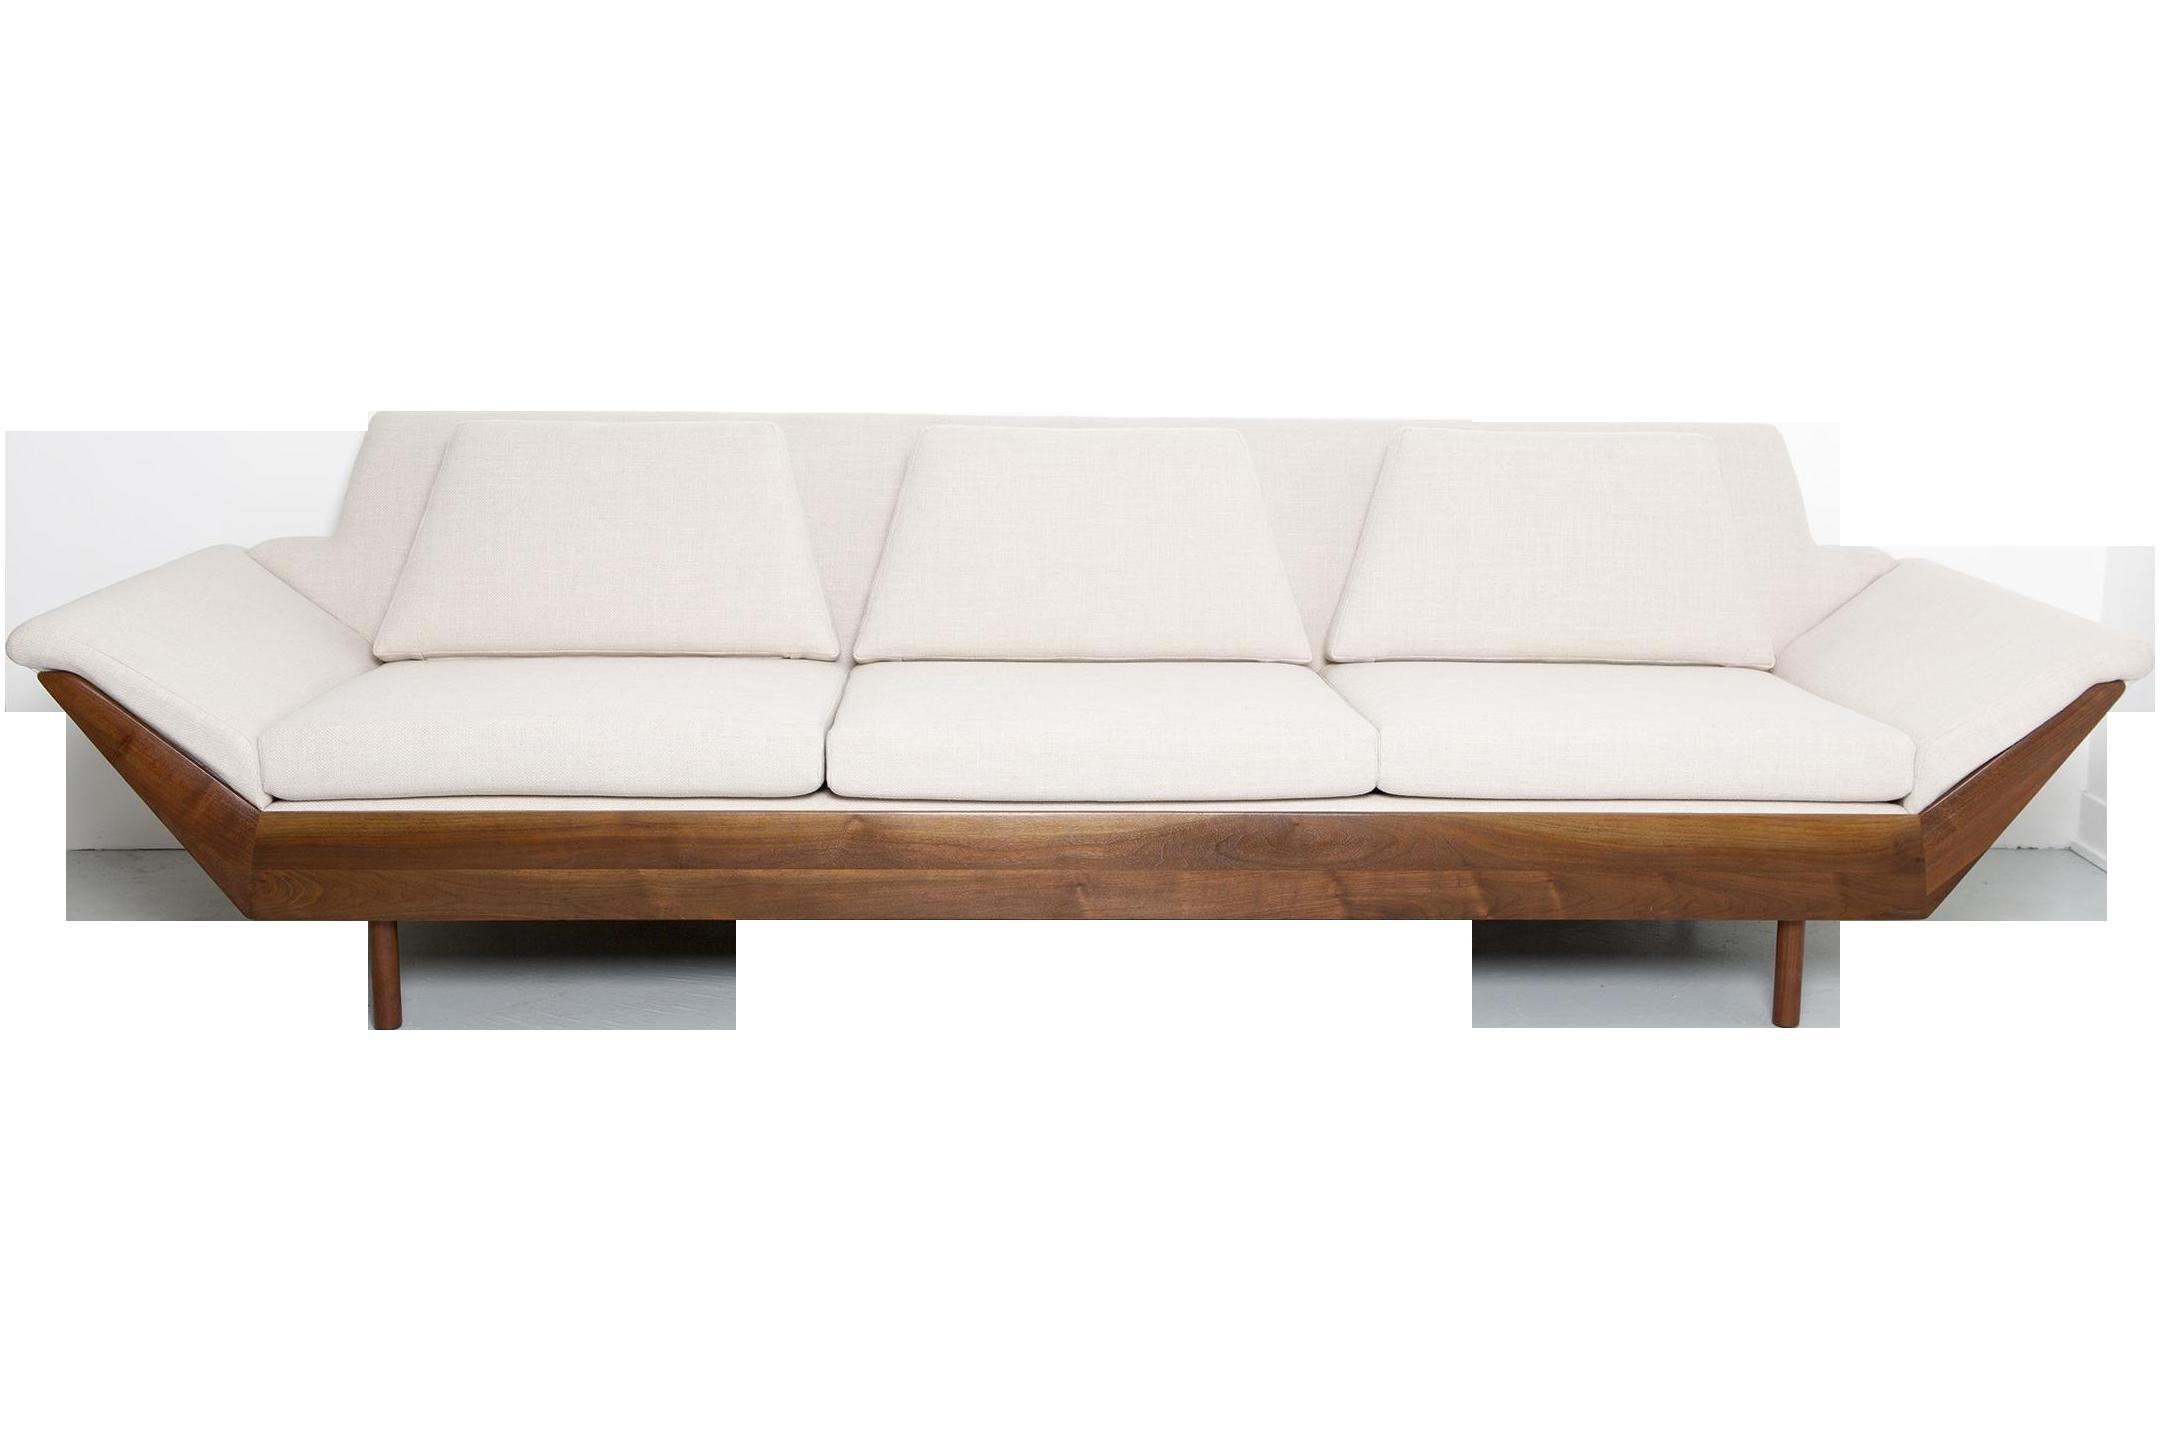 This is a beautiful thunderbird sofa by Flexsteel U S A c 1950s